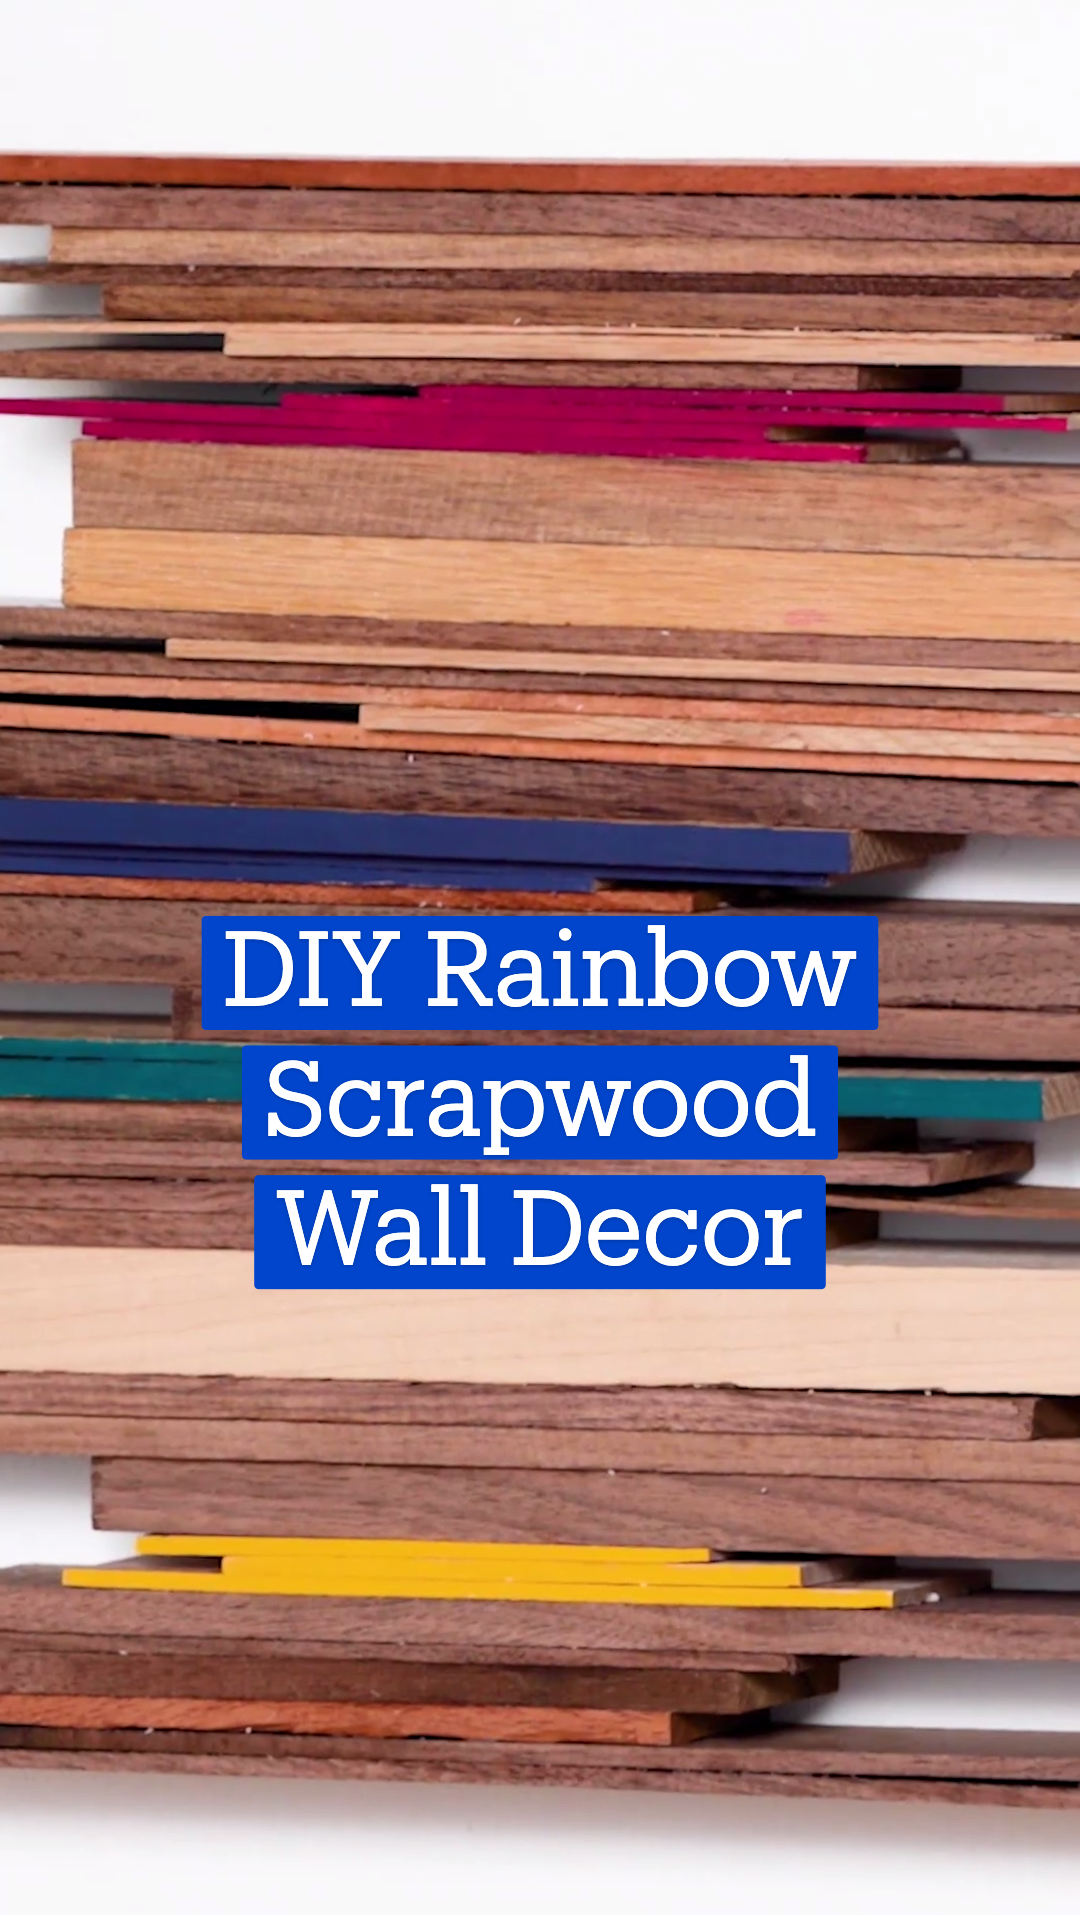 DIY Rainbow Scrapwood Wall Decor